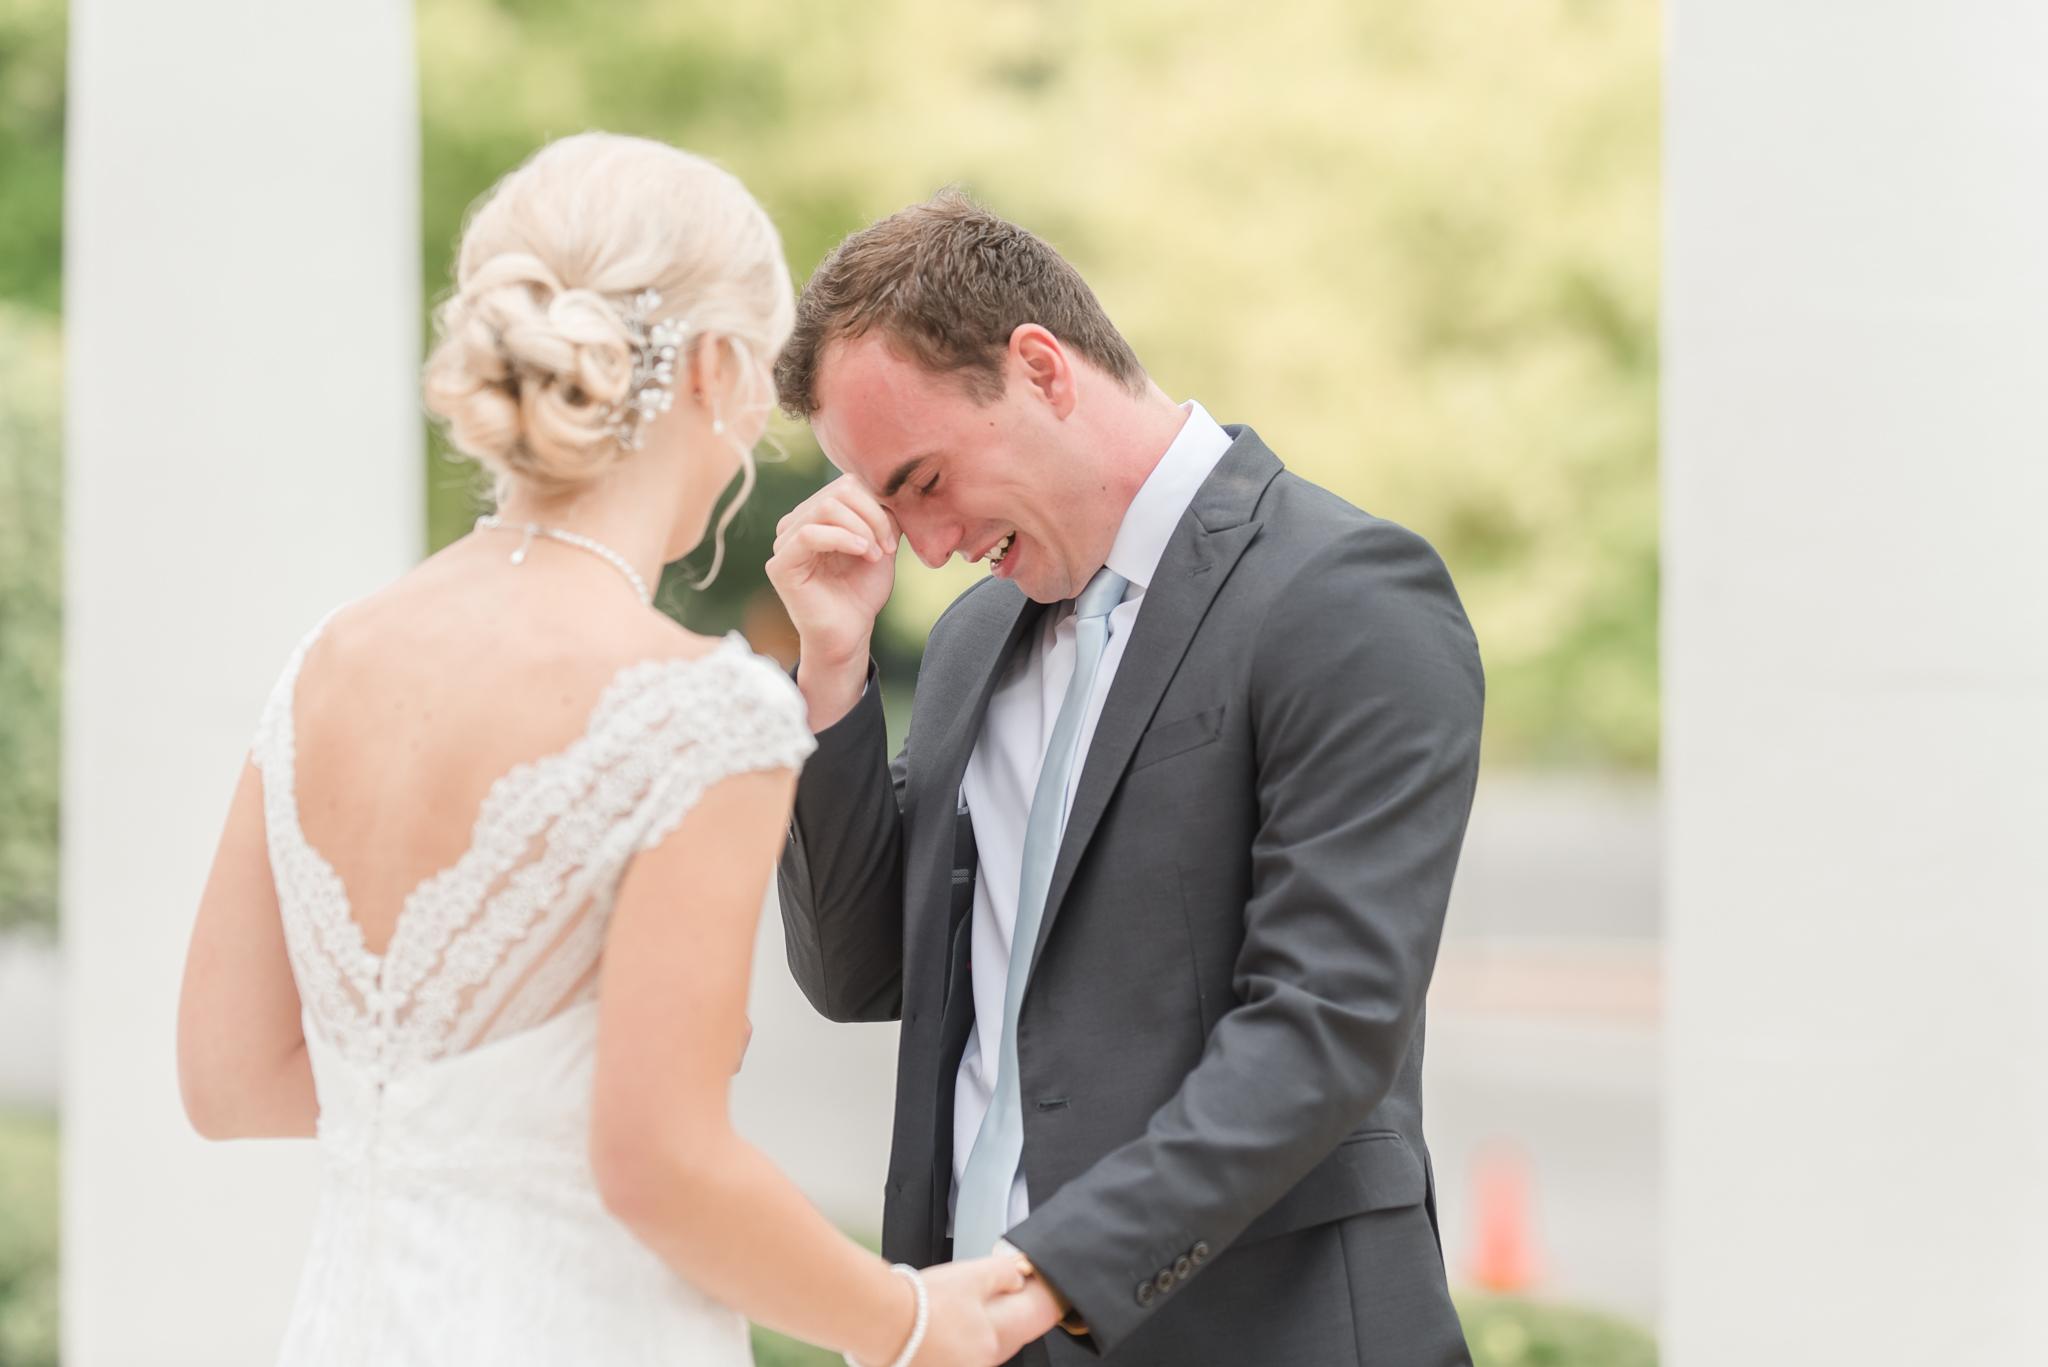 Westminister Hall Wedding Winona Lake Indiana8351.jpg